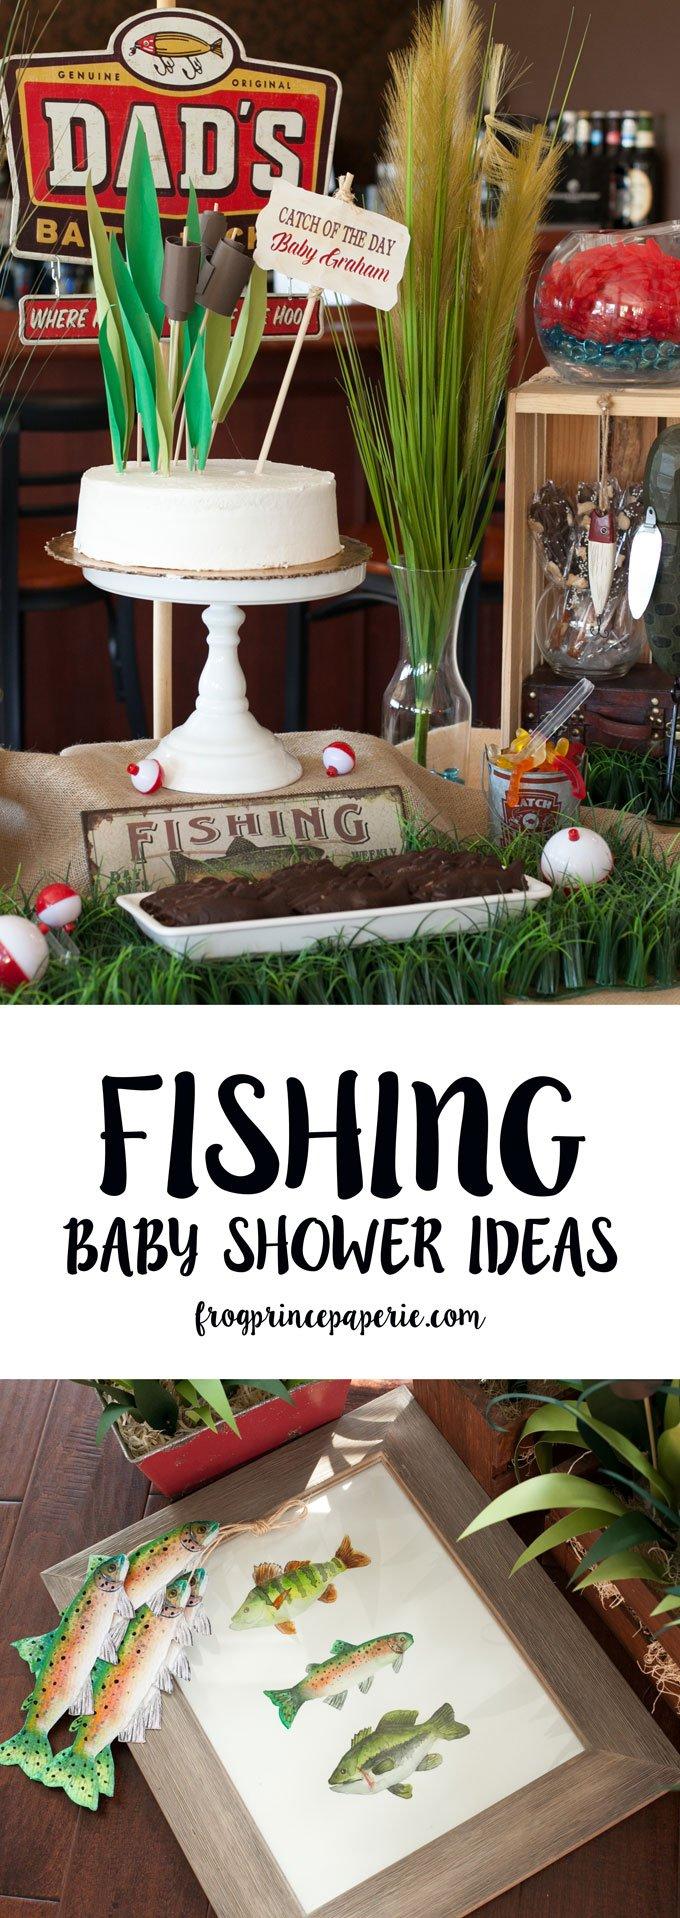 Fishing Baby Shower DIY Ideas